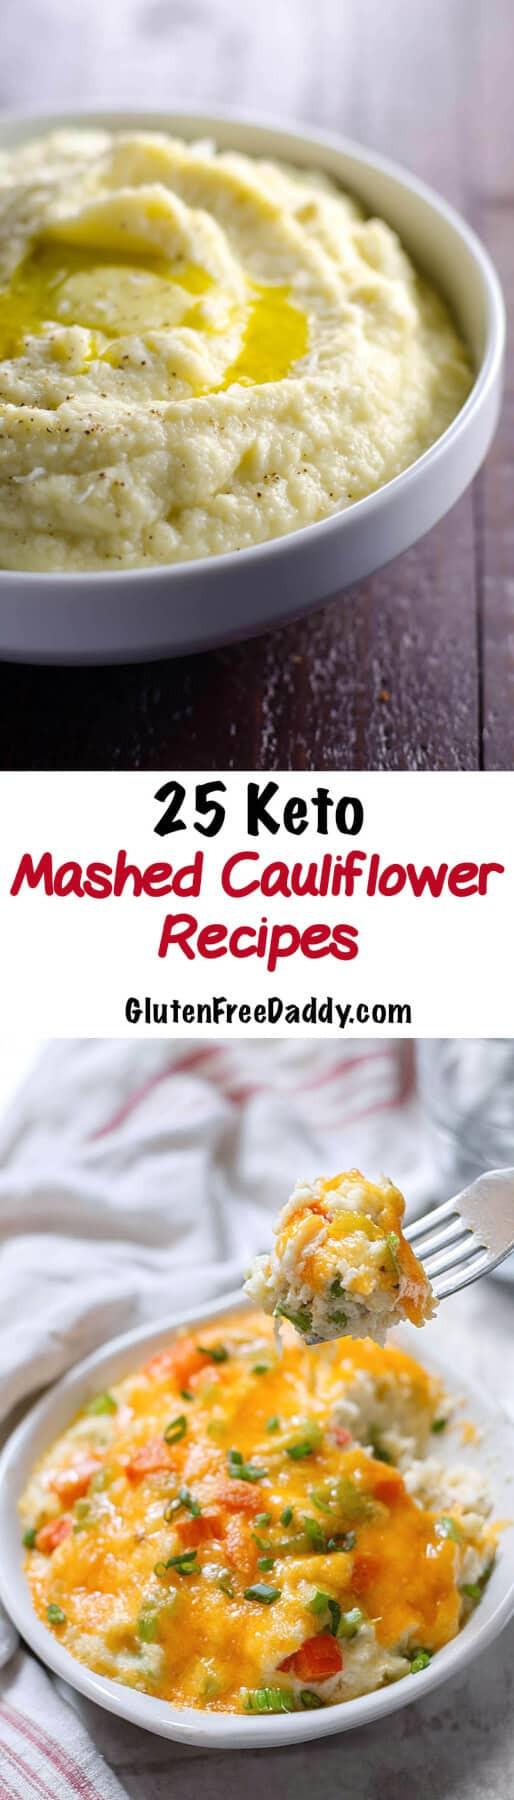 Cauliflower Mashed Potatoes Keto  9 of the Best Ever Mashed Cauliflower Keto Recipes